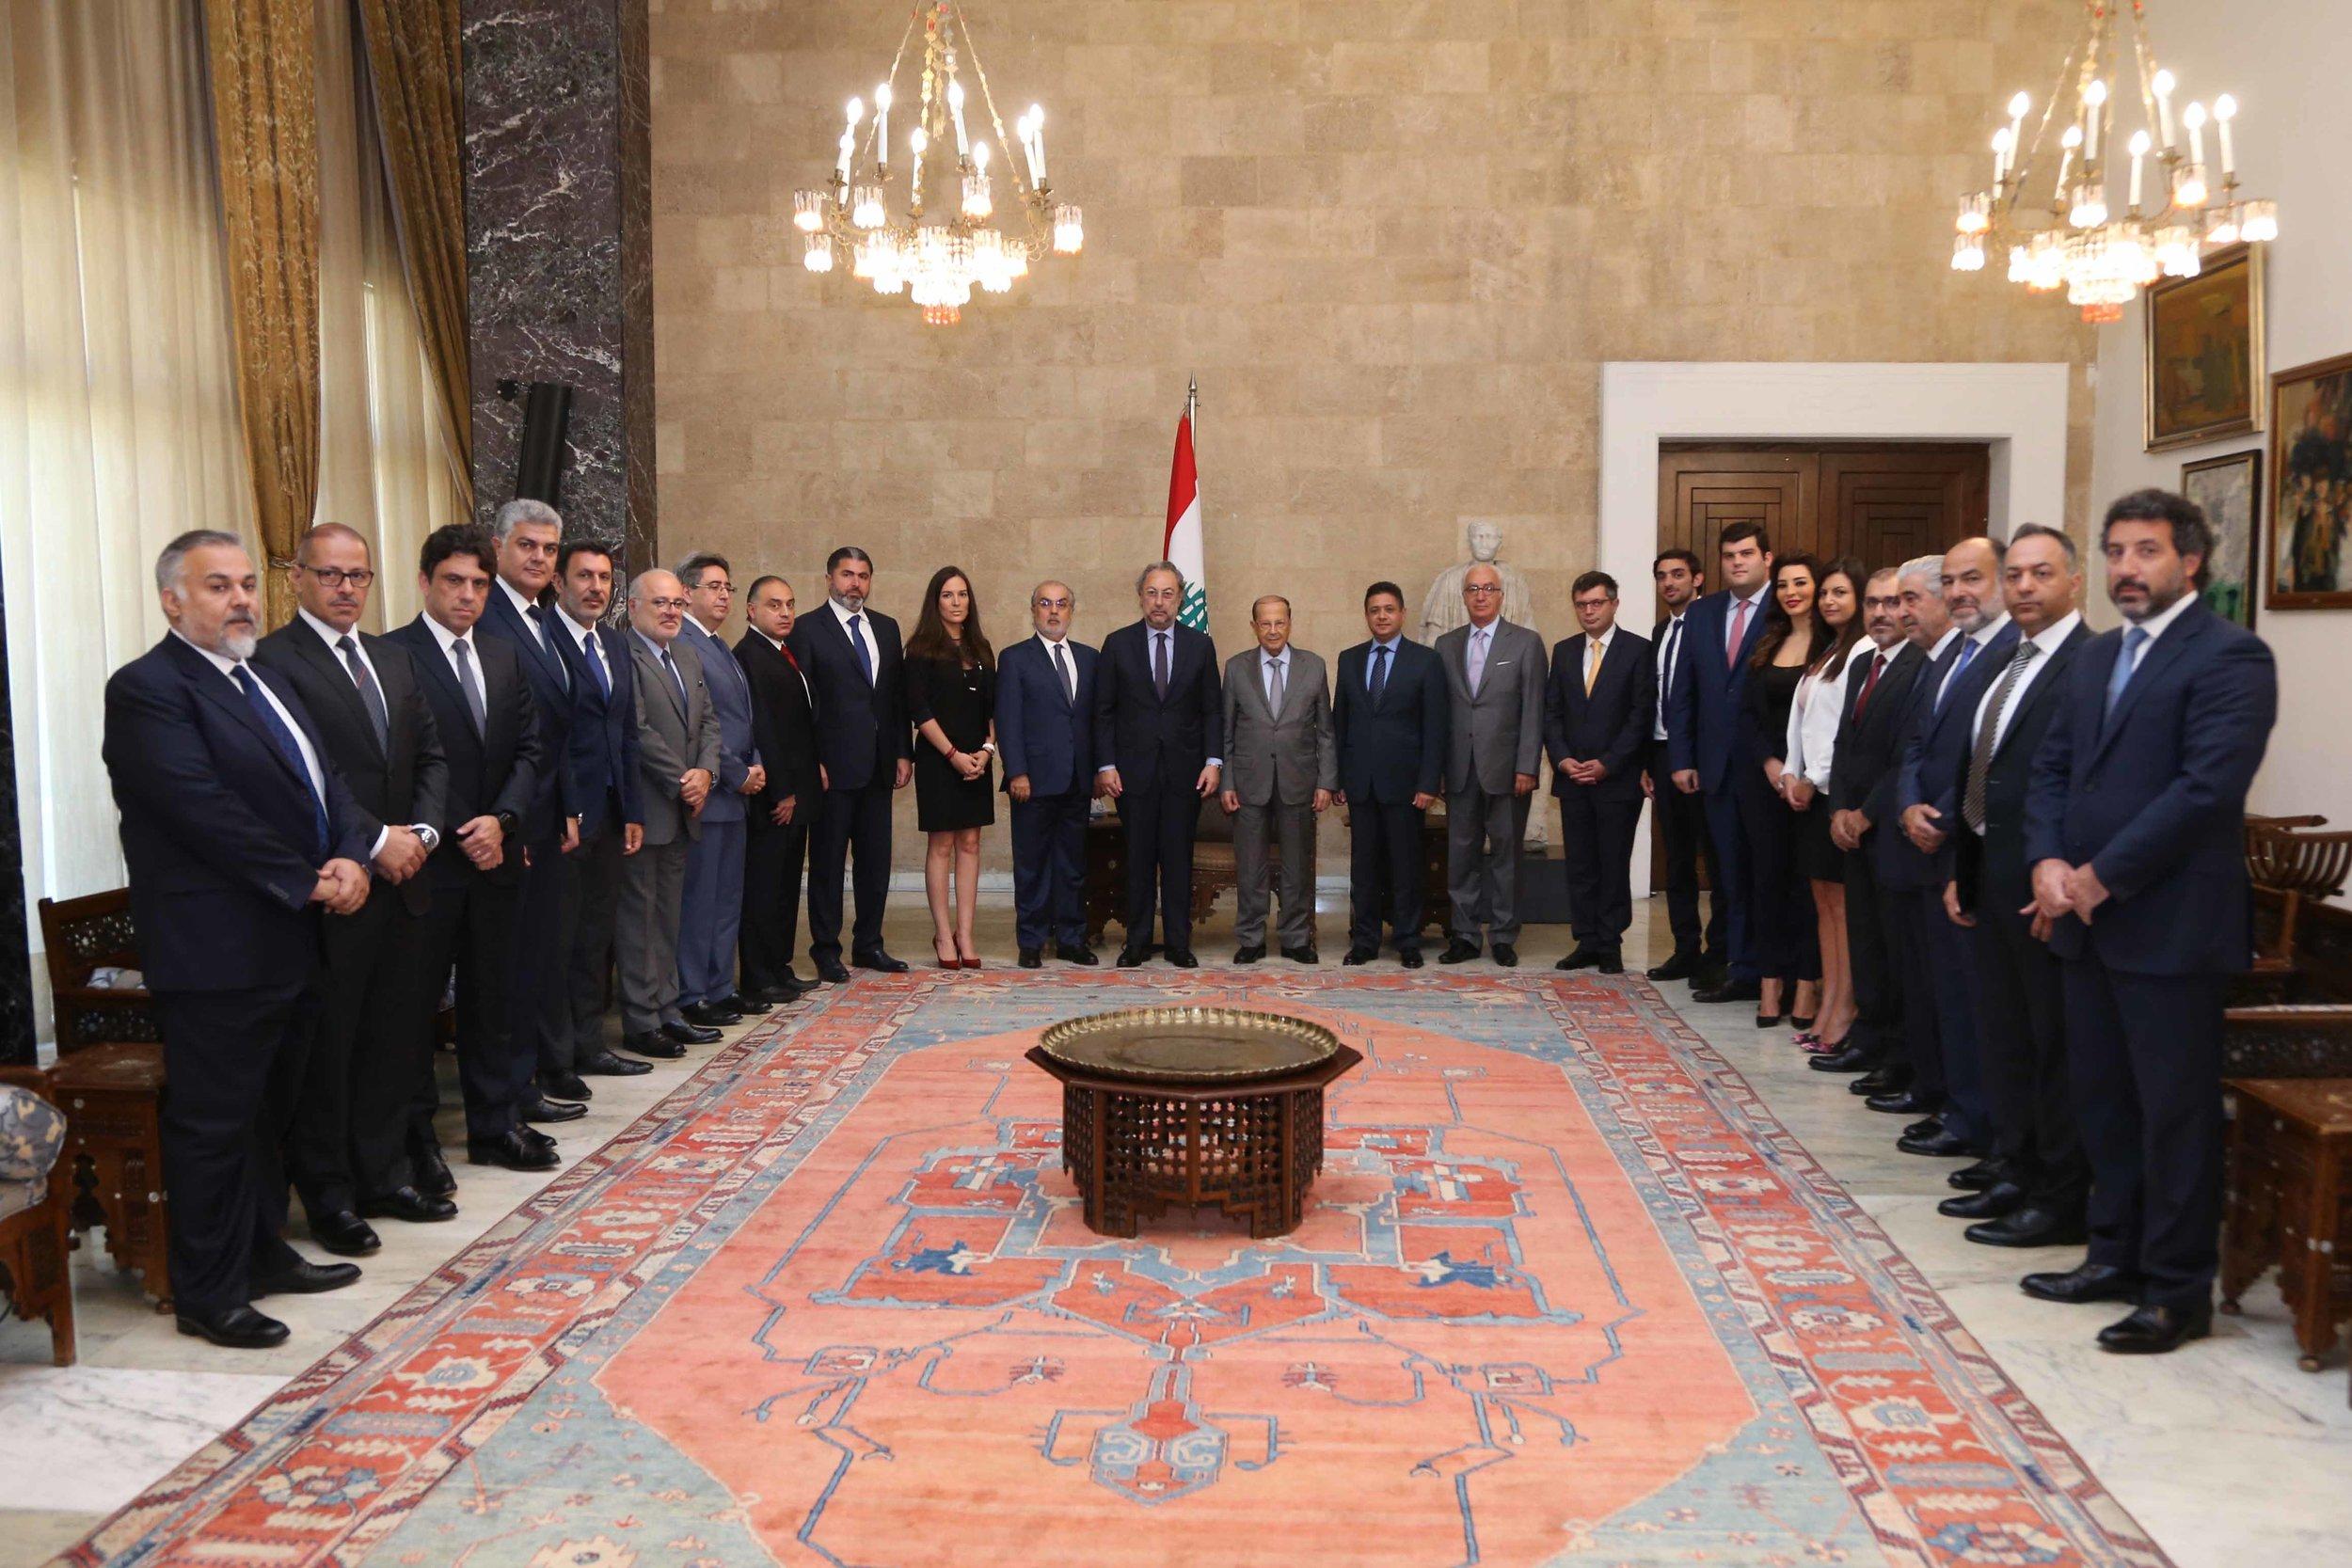 Presidential Visit Pic.jpg